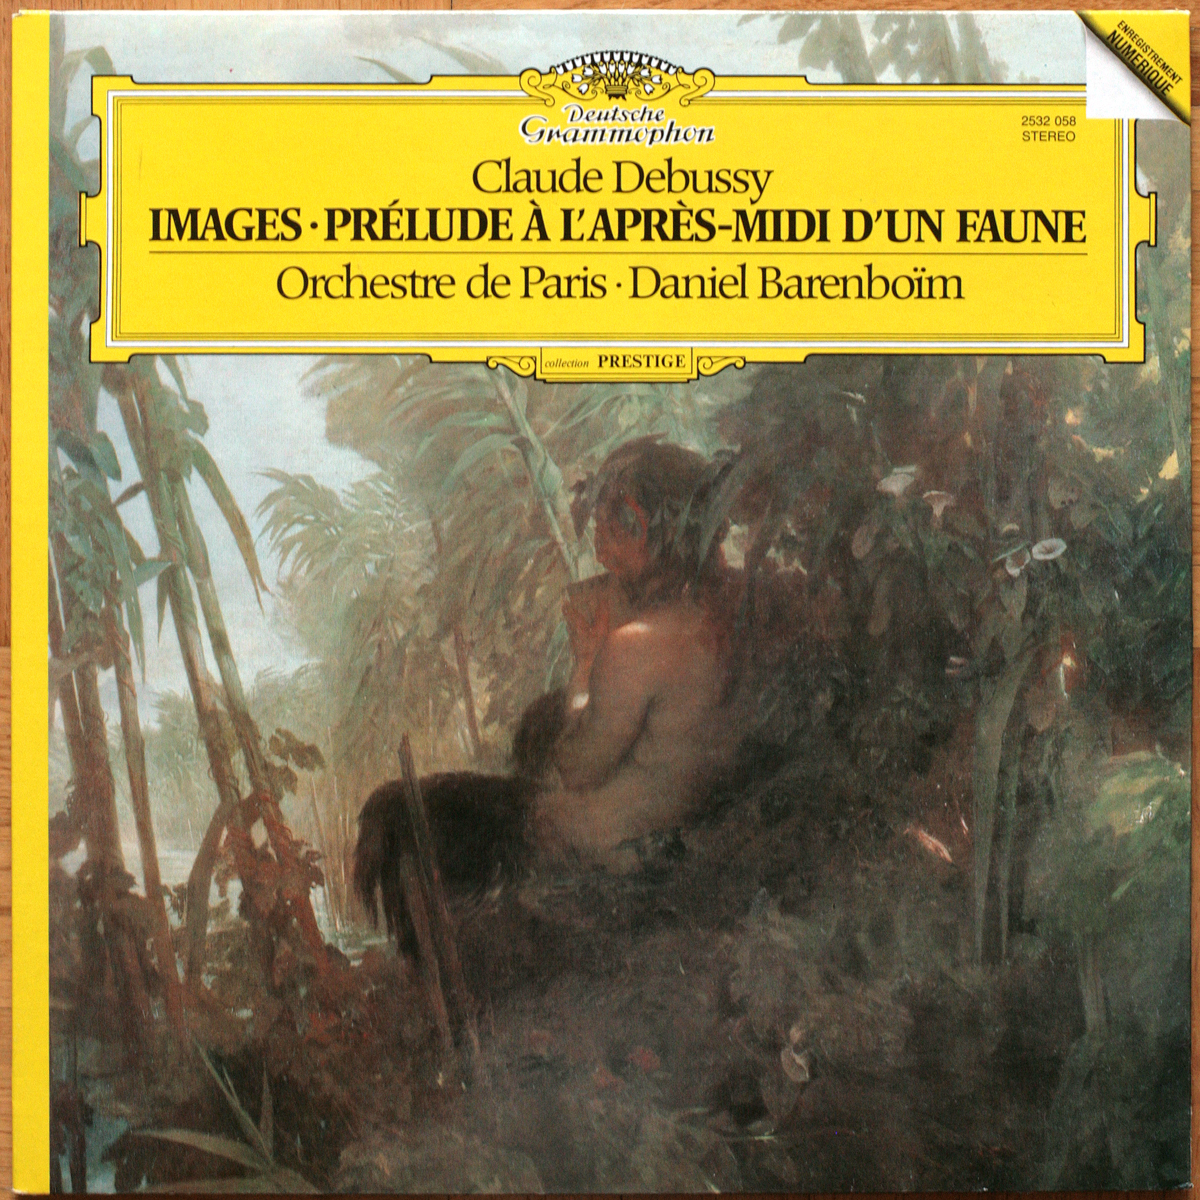 DGG 2532058 Debussy mages Barenboim